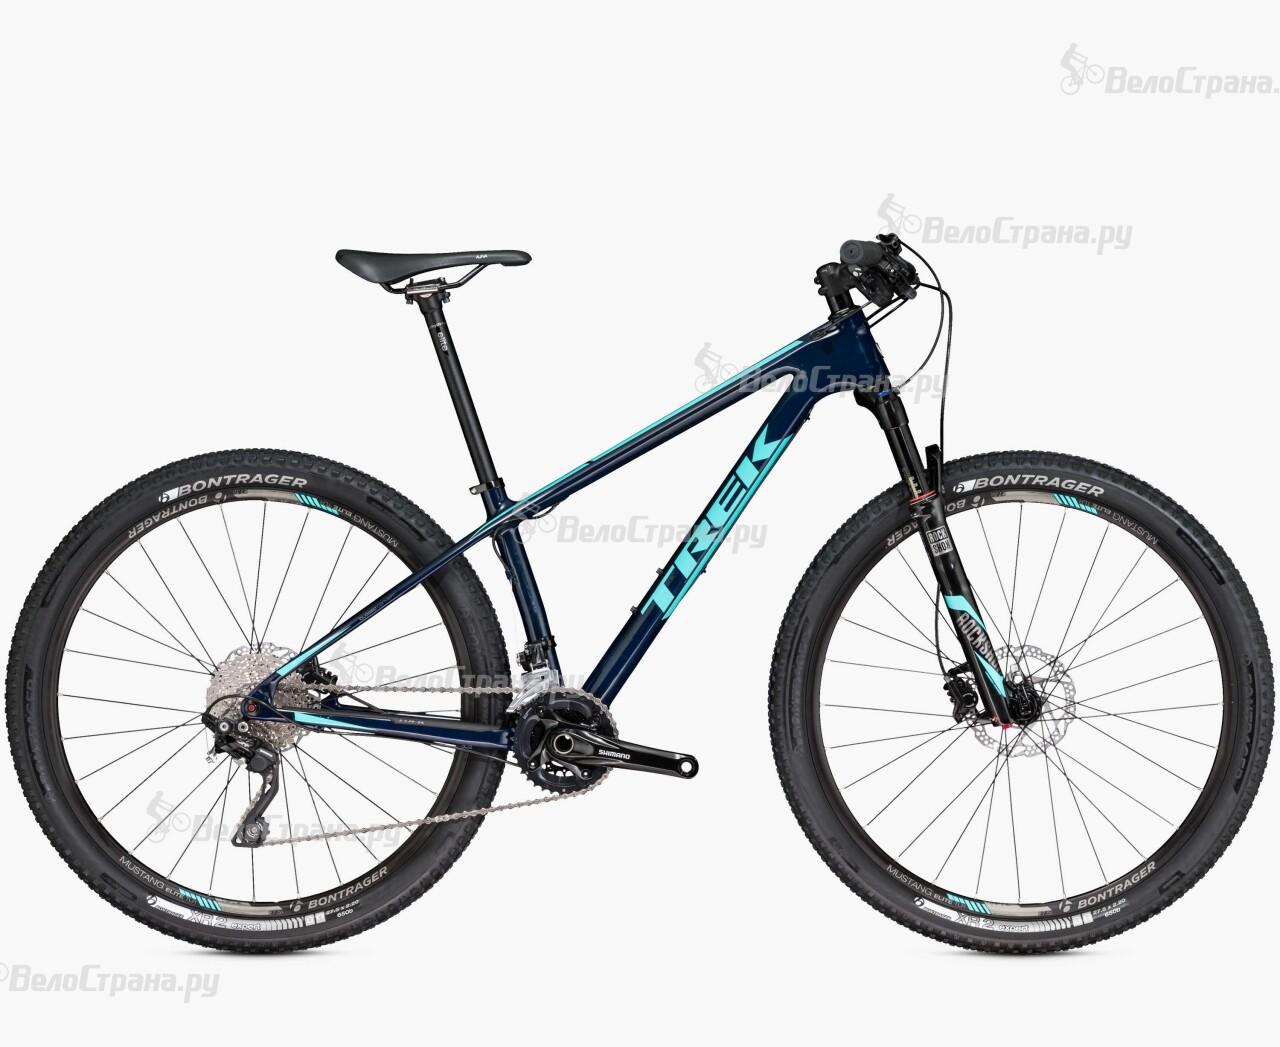 Велосипед Trek Superfly 9.6 Women's 27,5 (2016) цены онлайн